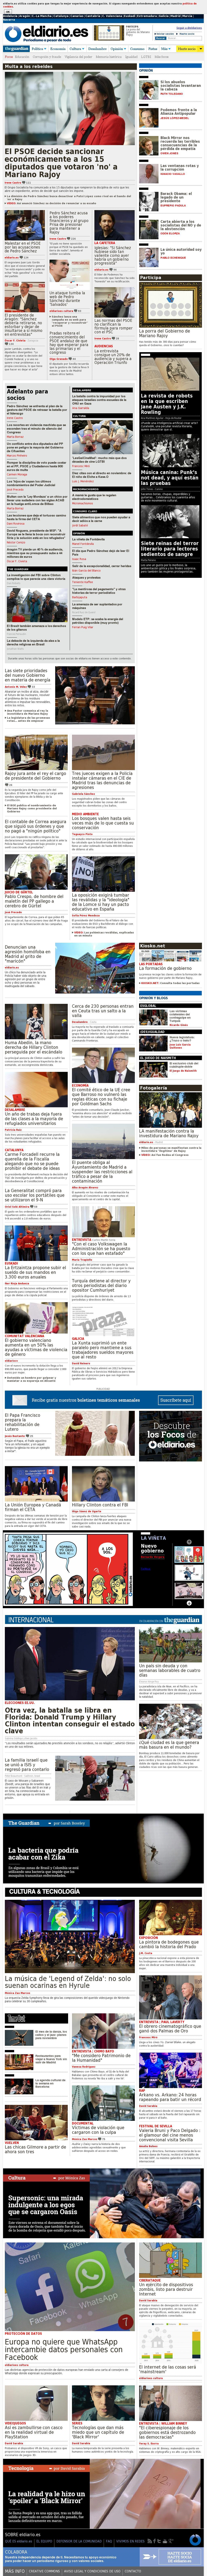 El Diario at Tuesday Nov. 1, 2016, 2:03 a.m. UTC